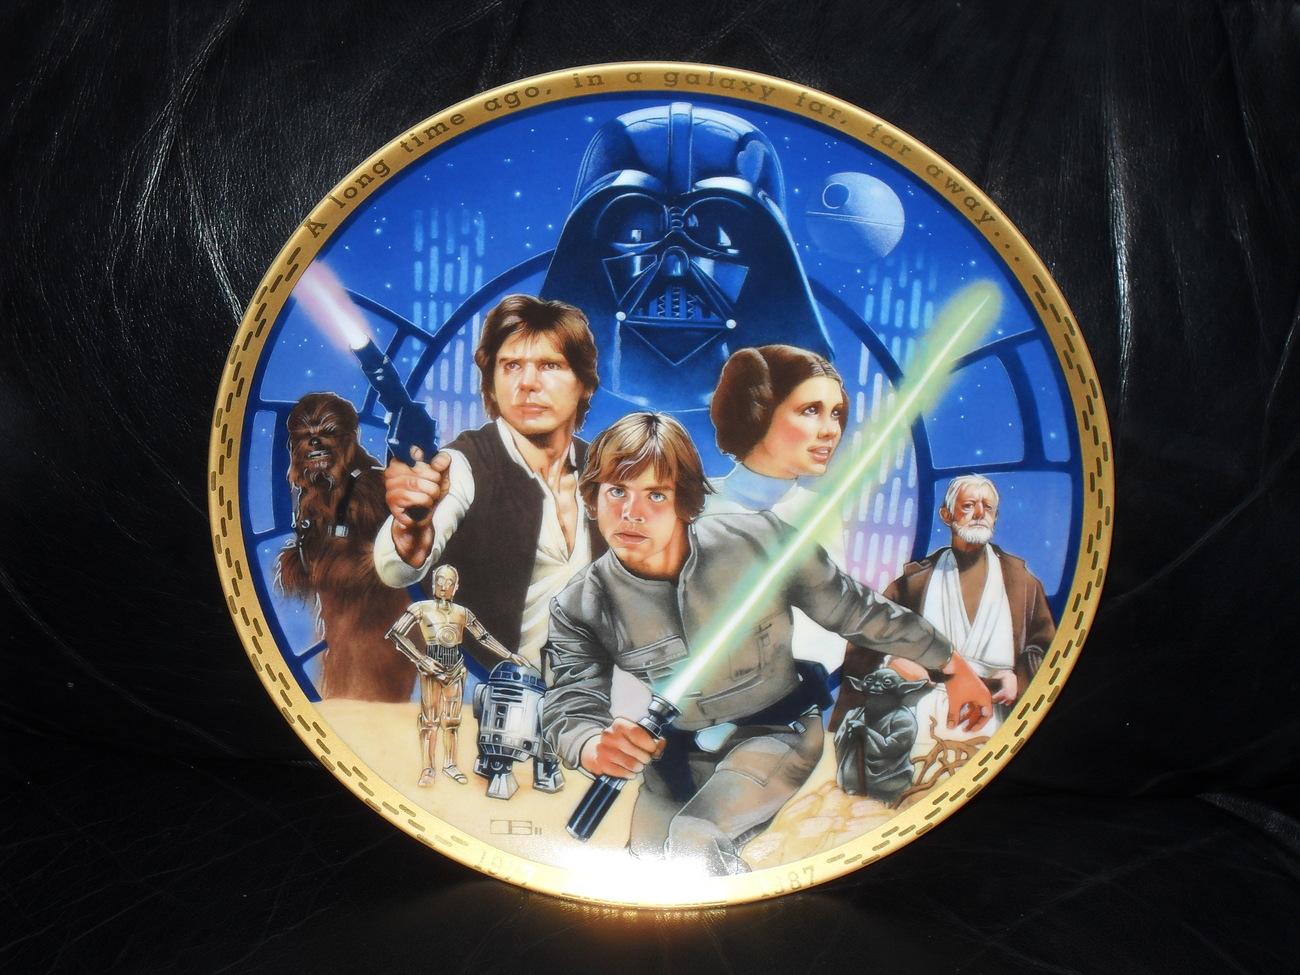 Star Wars 1988  10th Anniversary Commemorative Plate